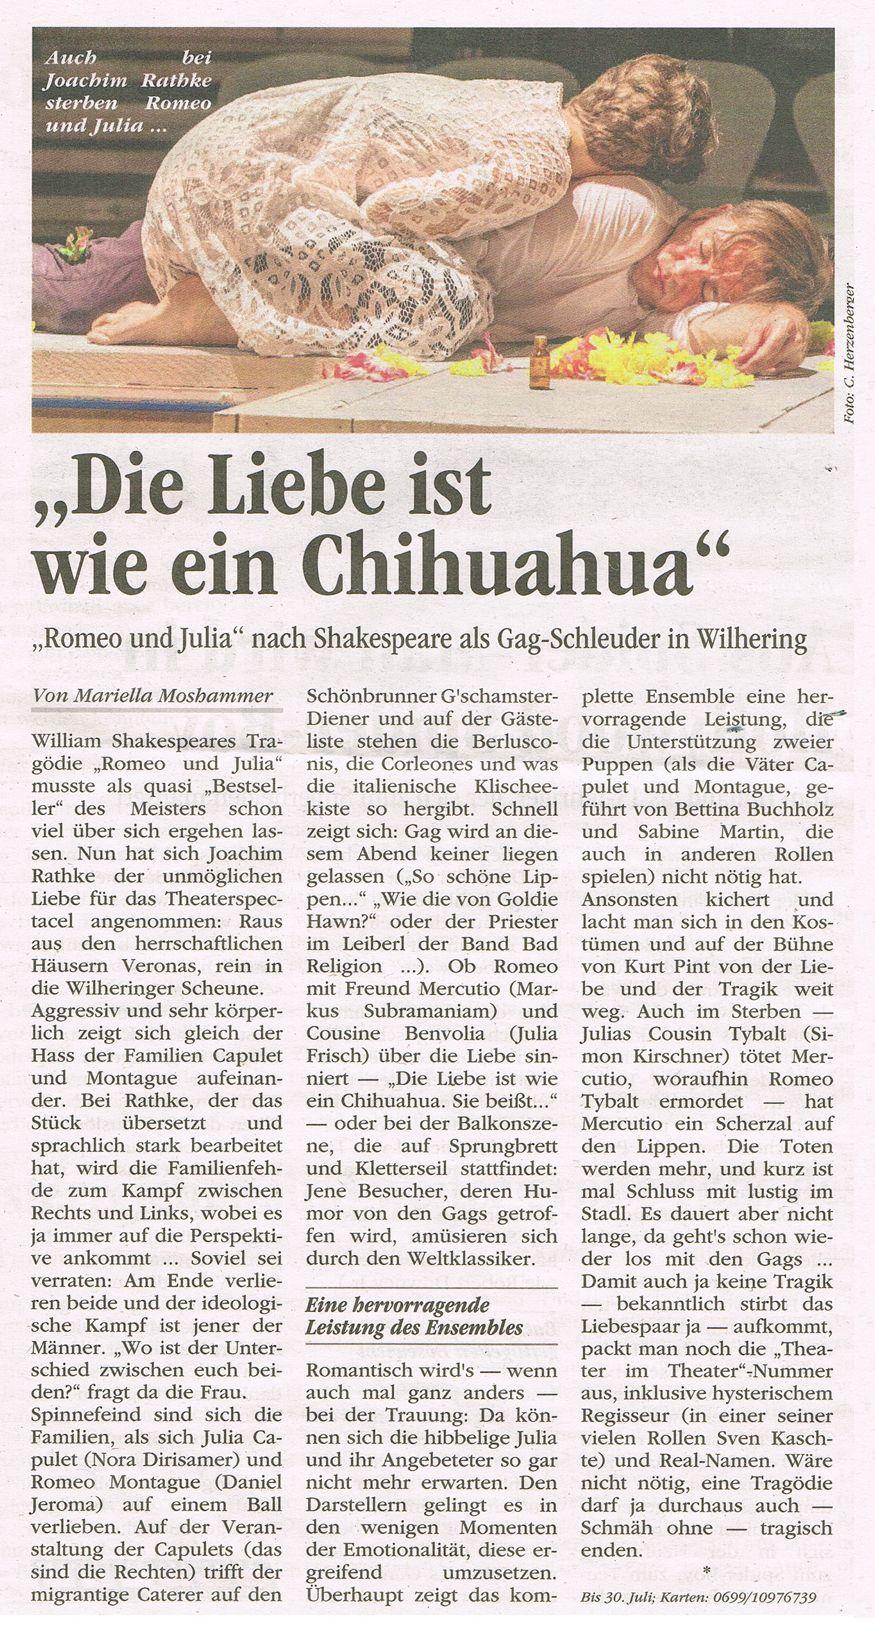 Volksblatt über Romeo und Julia